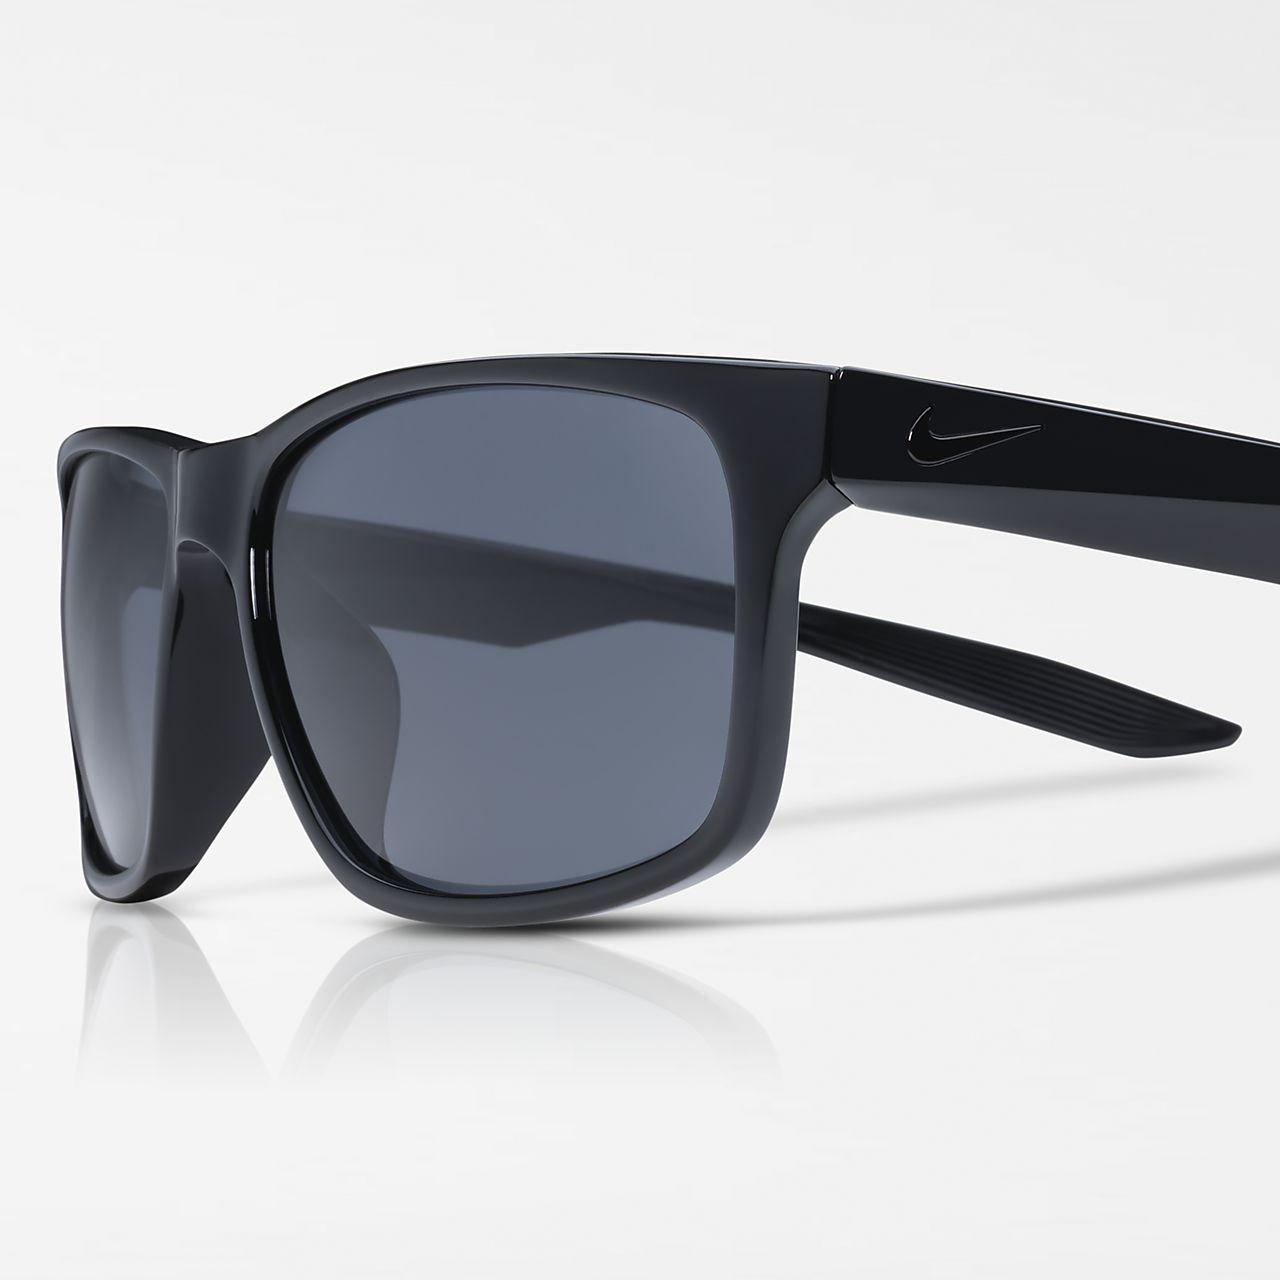 d53d01729a Low Resolution Γυαλιά ηλίου Nike Essential Chaser Γυαλιά ηλίου Nike  Essential Chaser